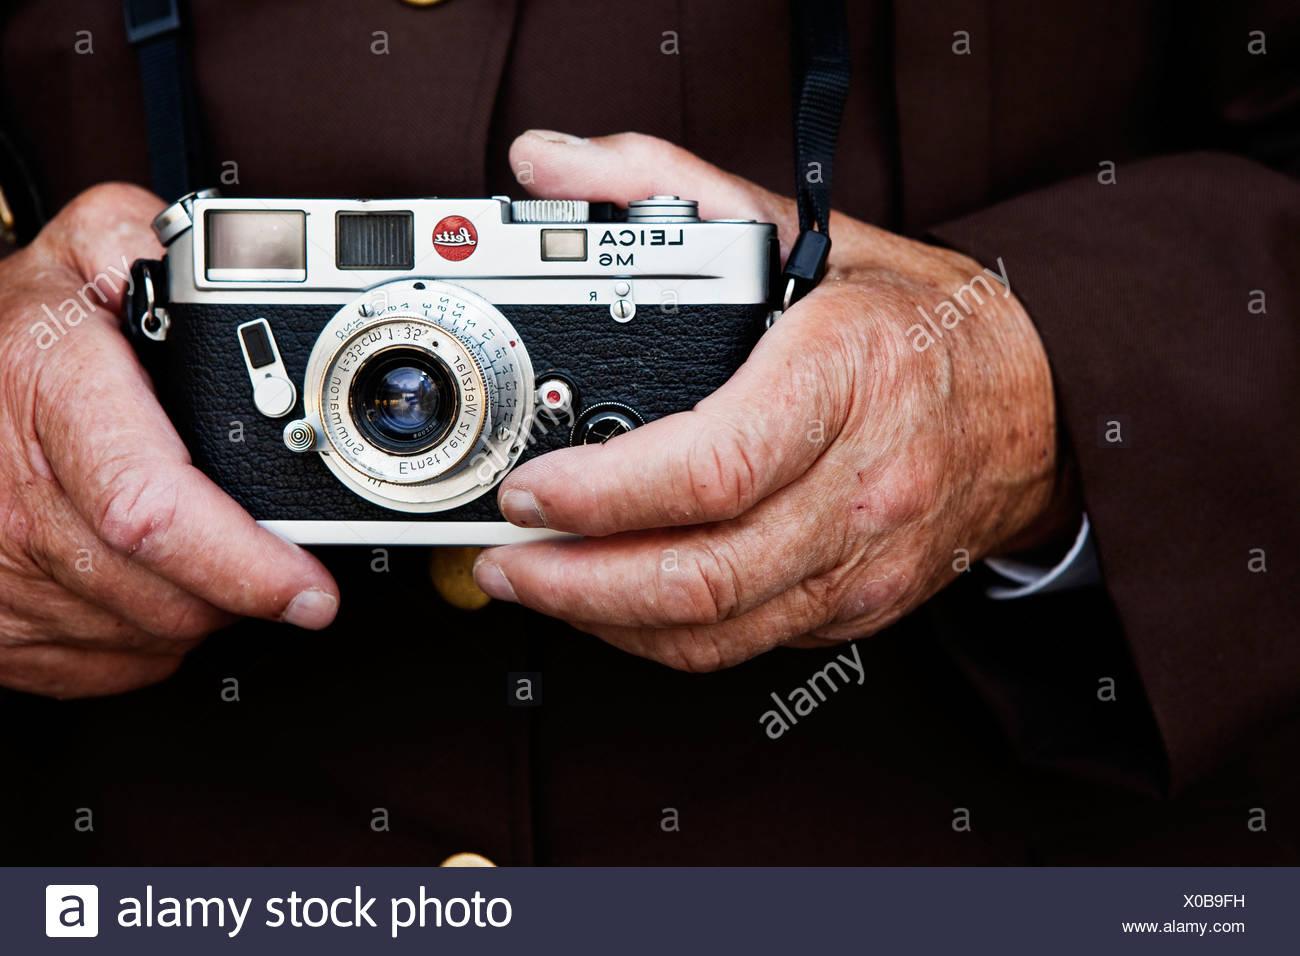 Hands of an elderly man holding a Leica rangefinder camera, North Tyrol, Austria, Europe - Stock Image